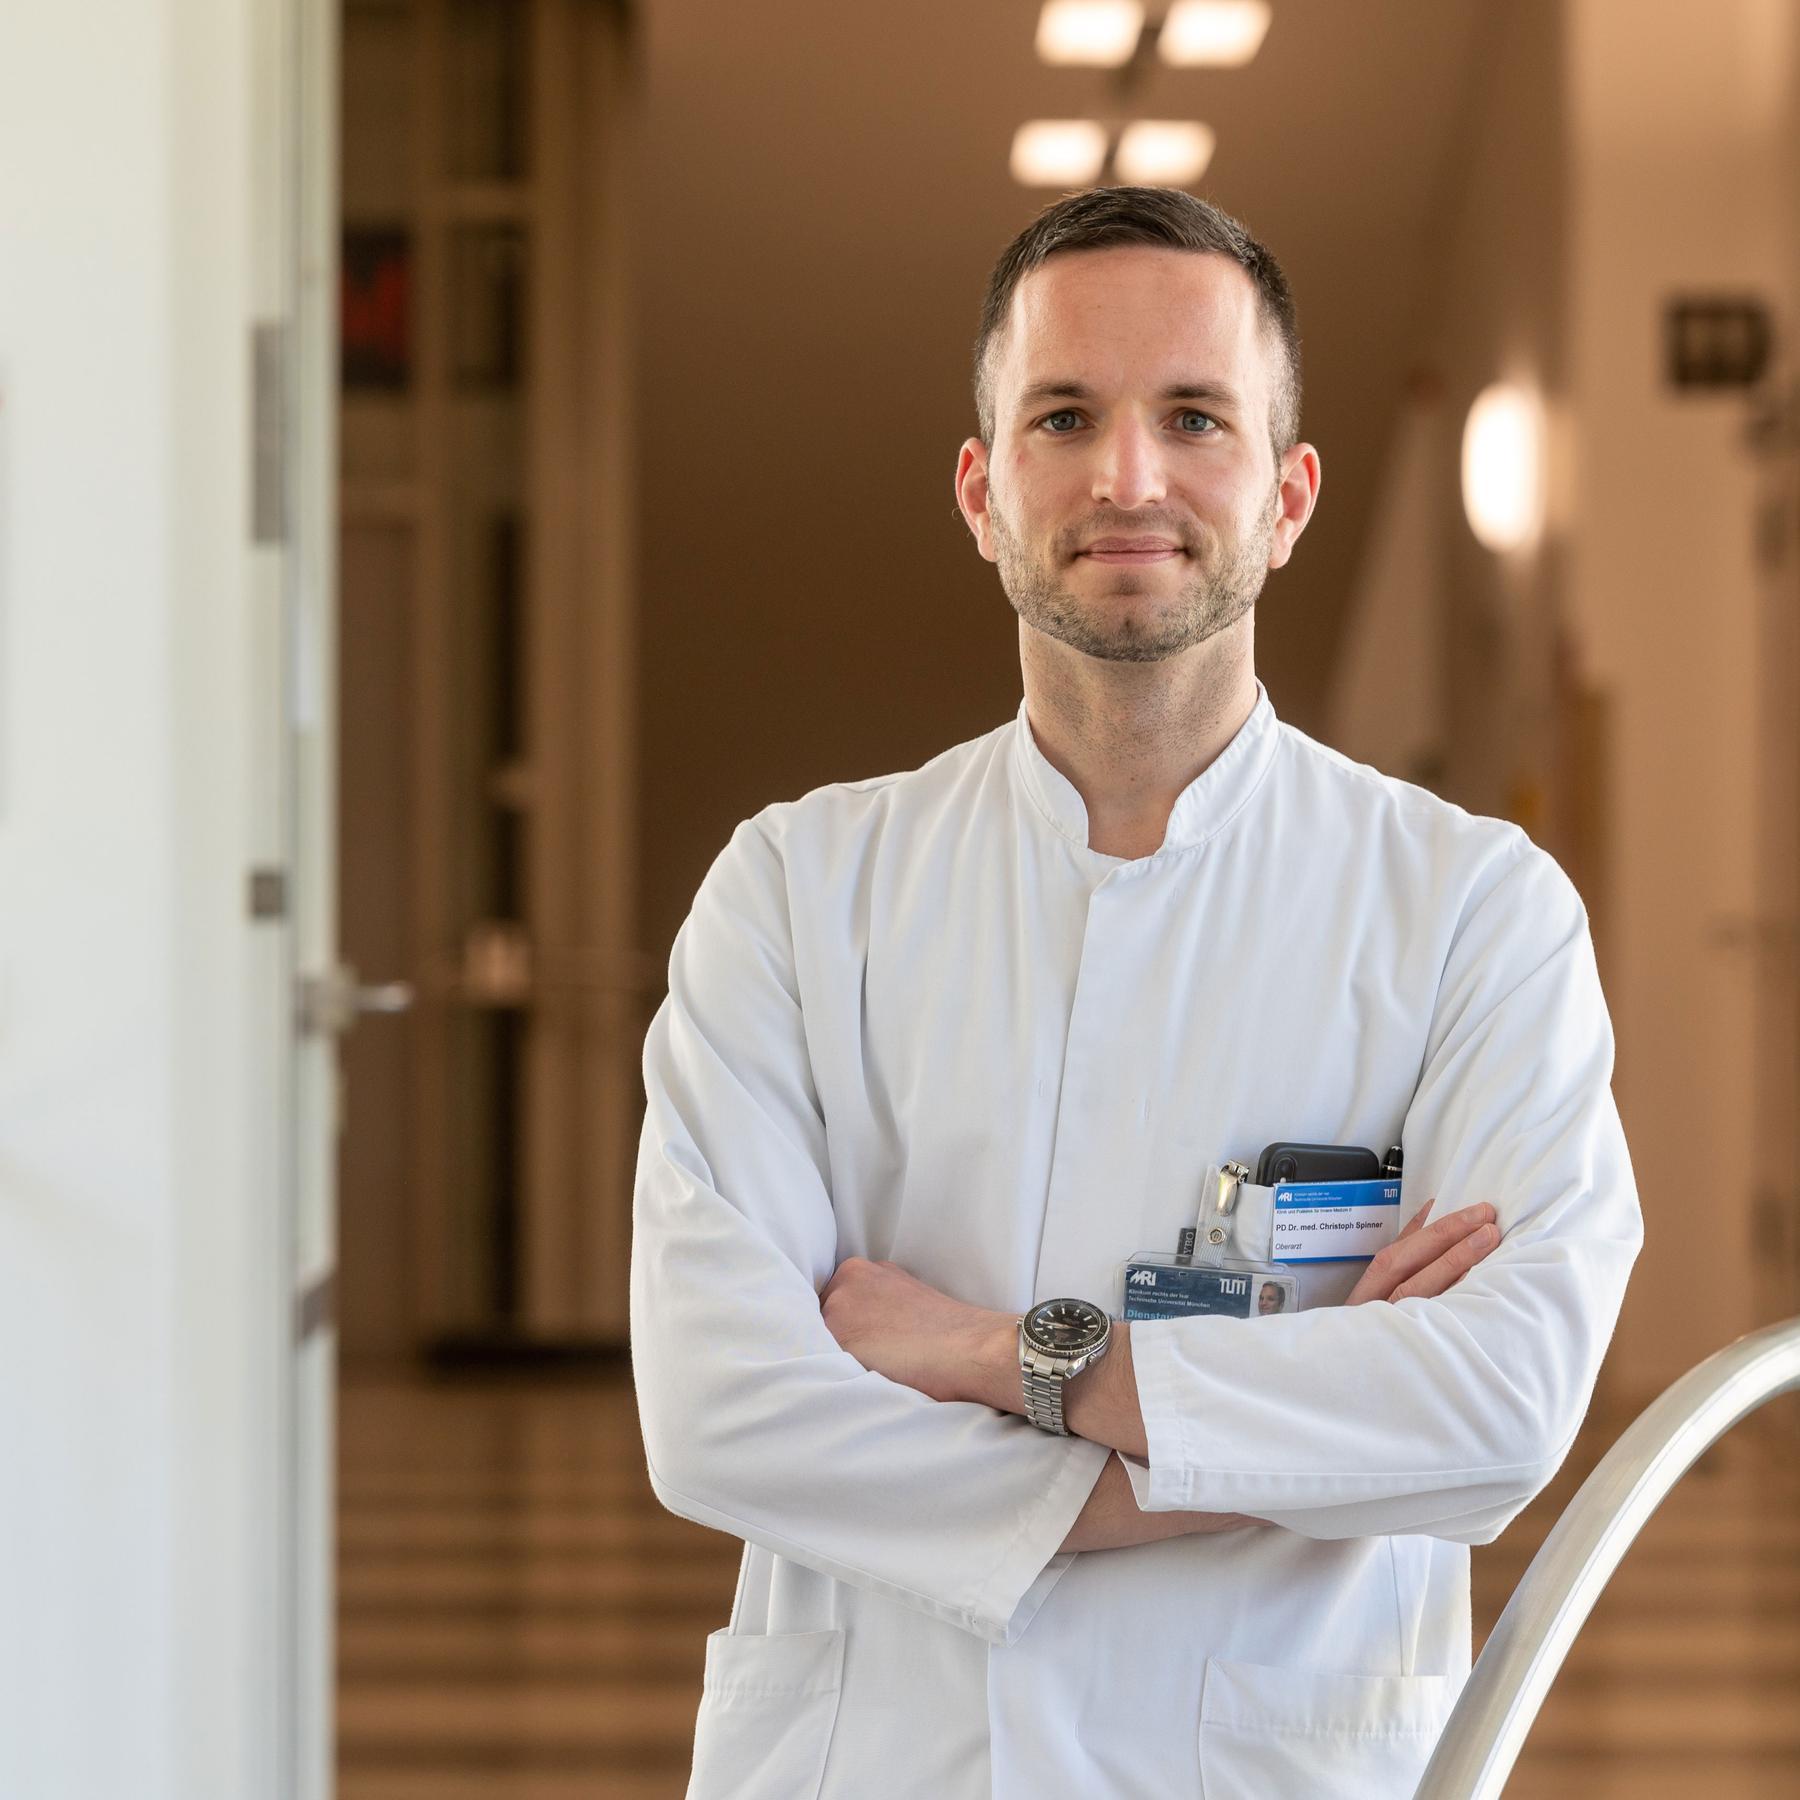 Corona-News mit Dr. Christoph Spinner (28.09.2021)